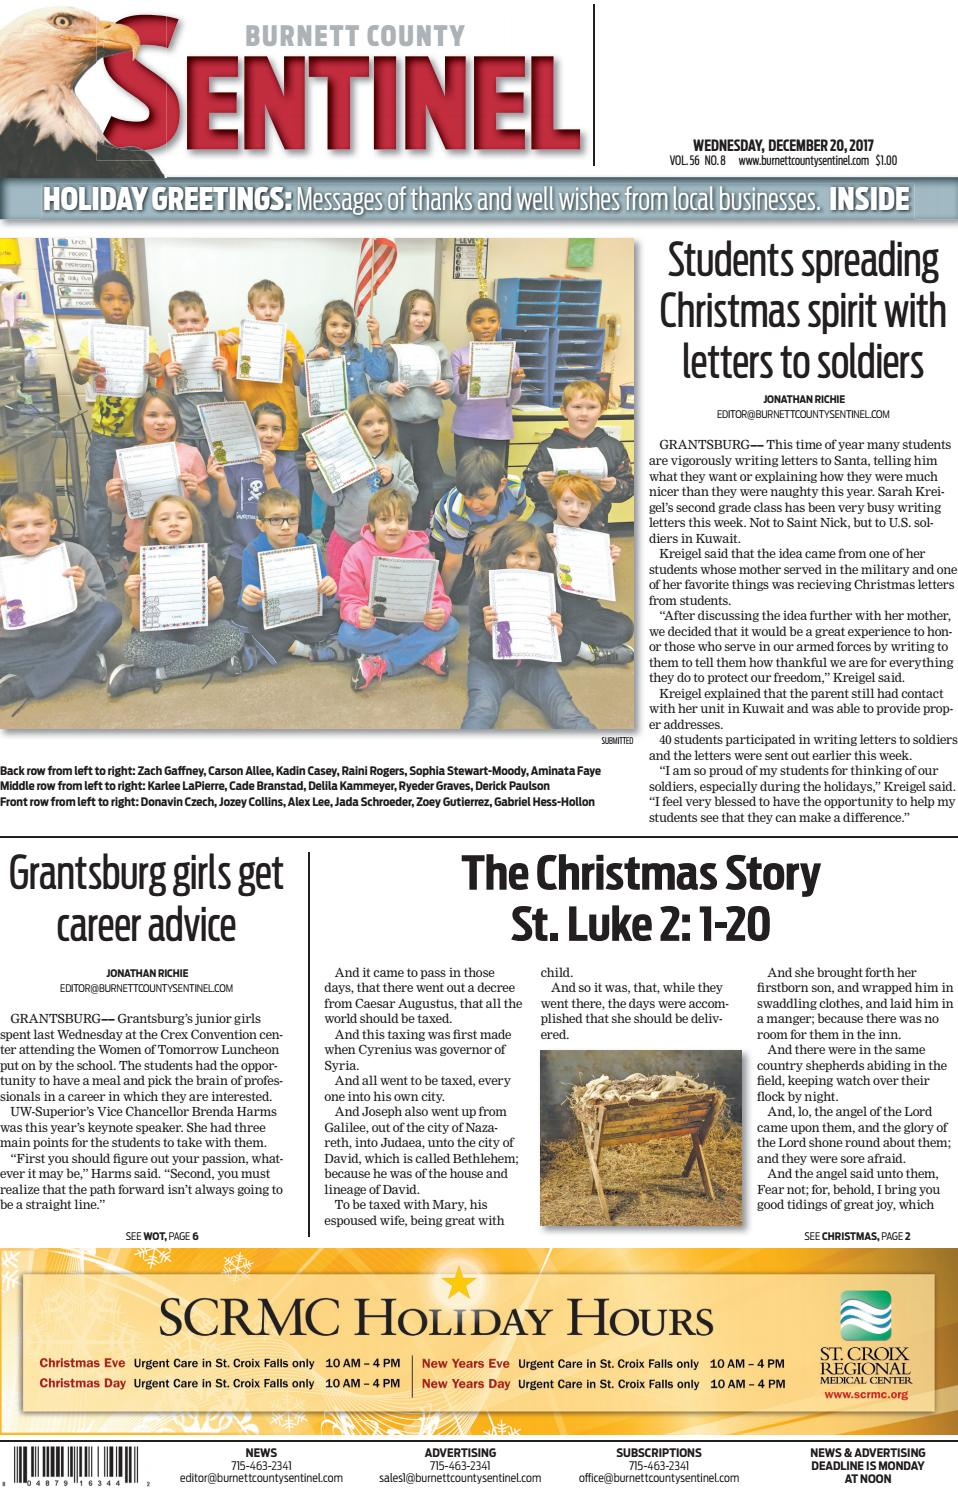 Bcs 12 20 17 by Burnett County Sentinel - issuu